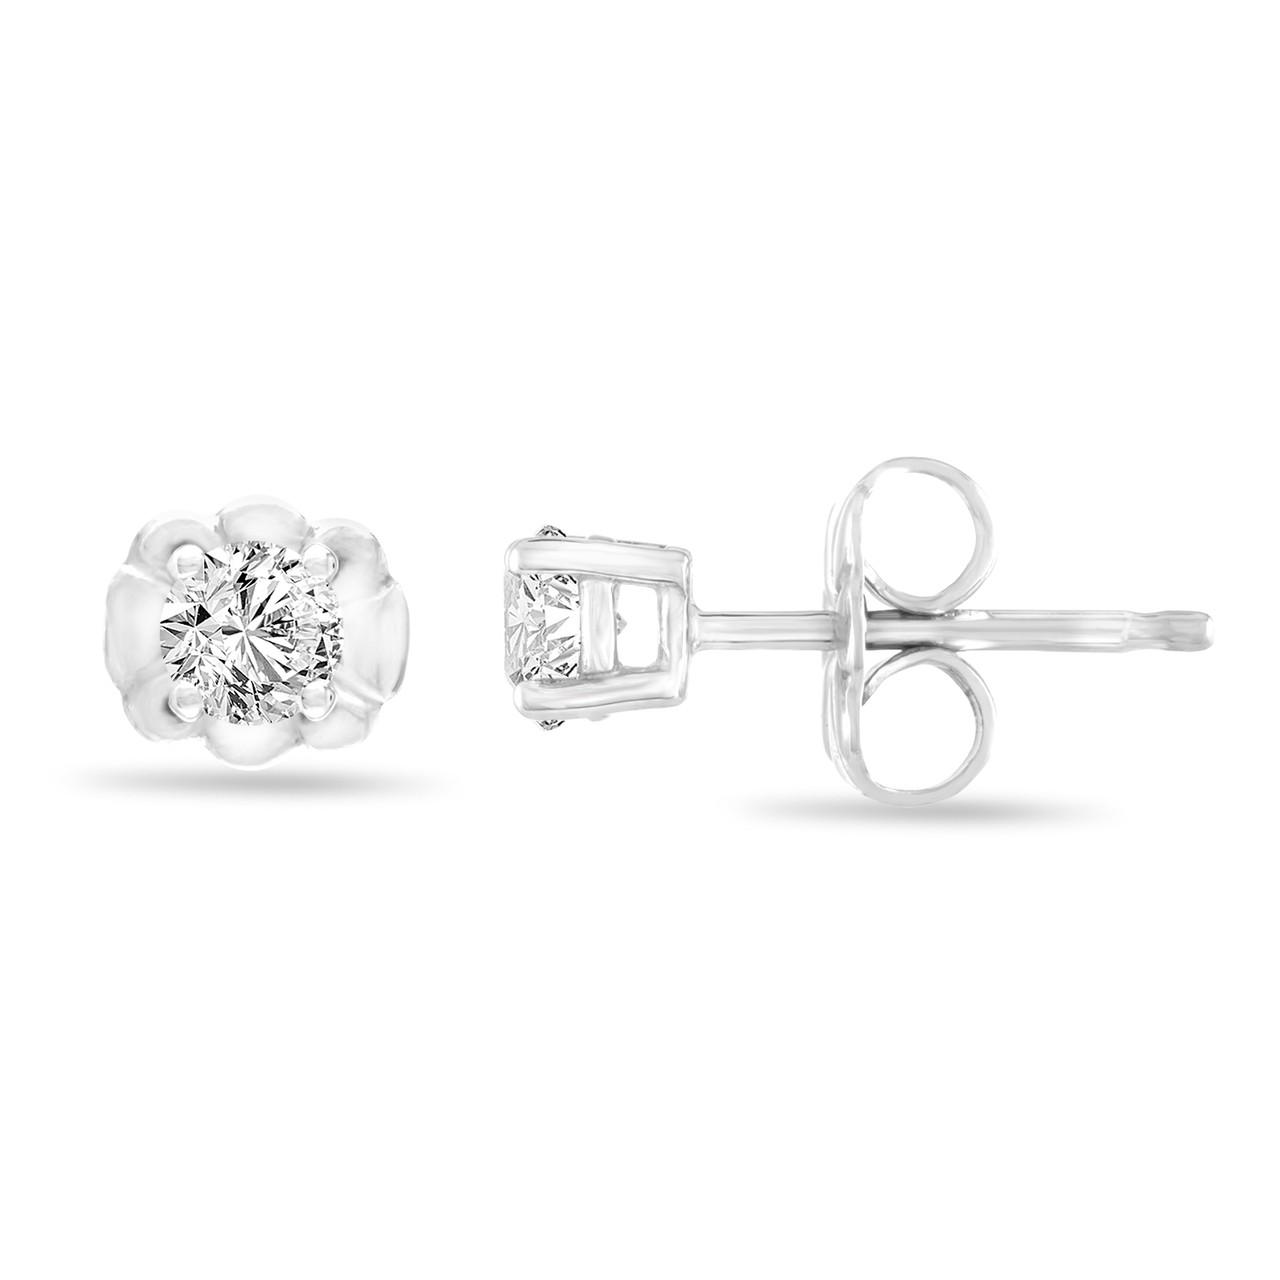 Platinum Diamond Stud Earrings 0 30 Carat Tiny Diamond Earrings Handmade Certified